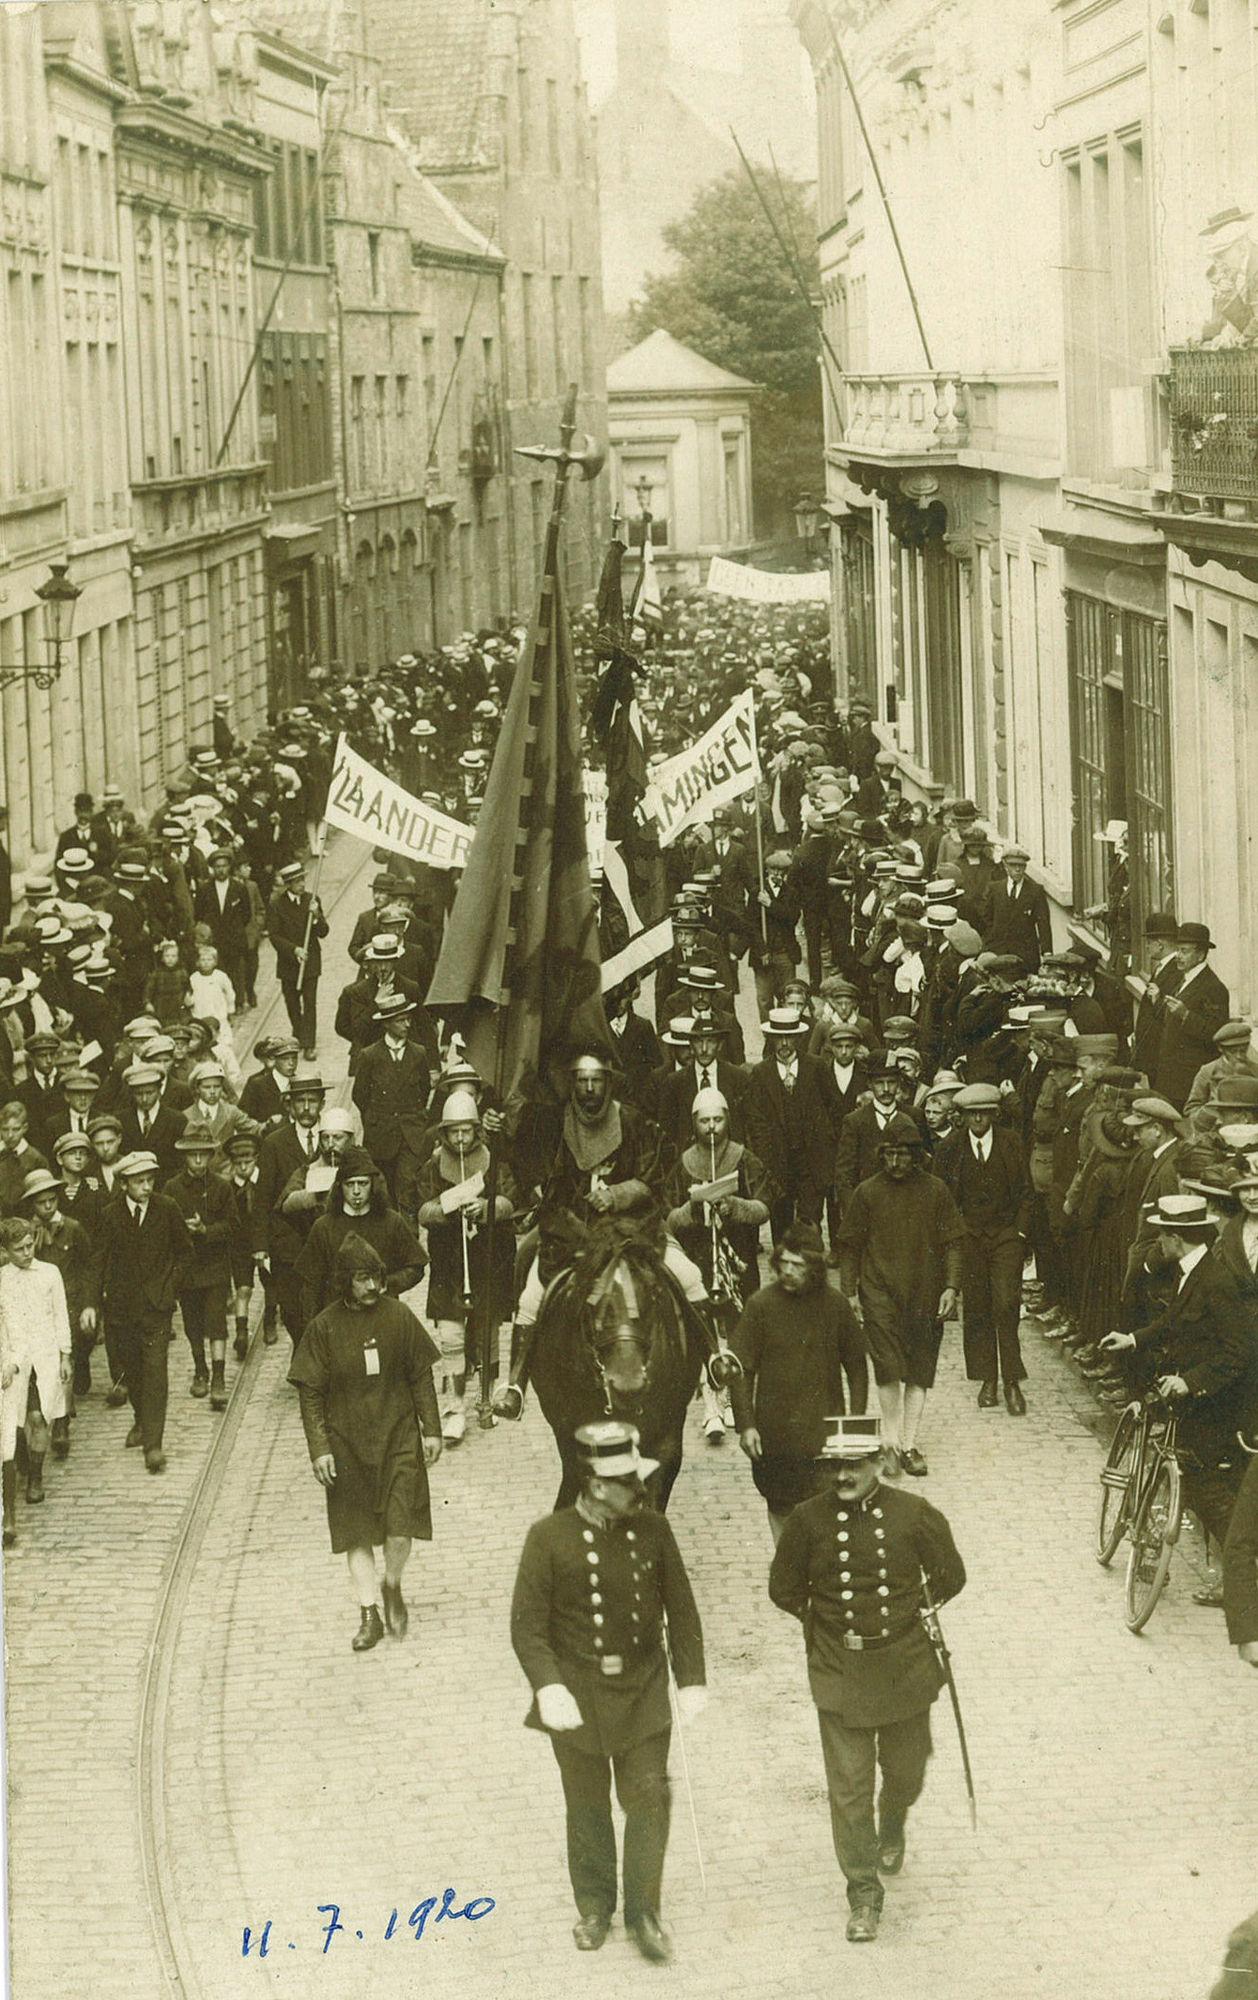 11 julistoet, 1920